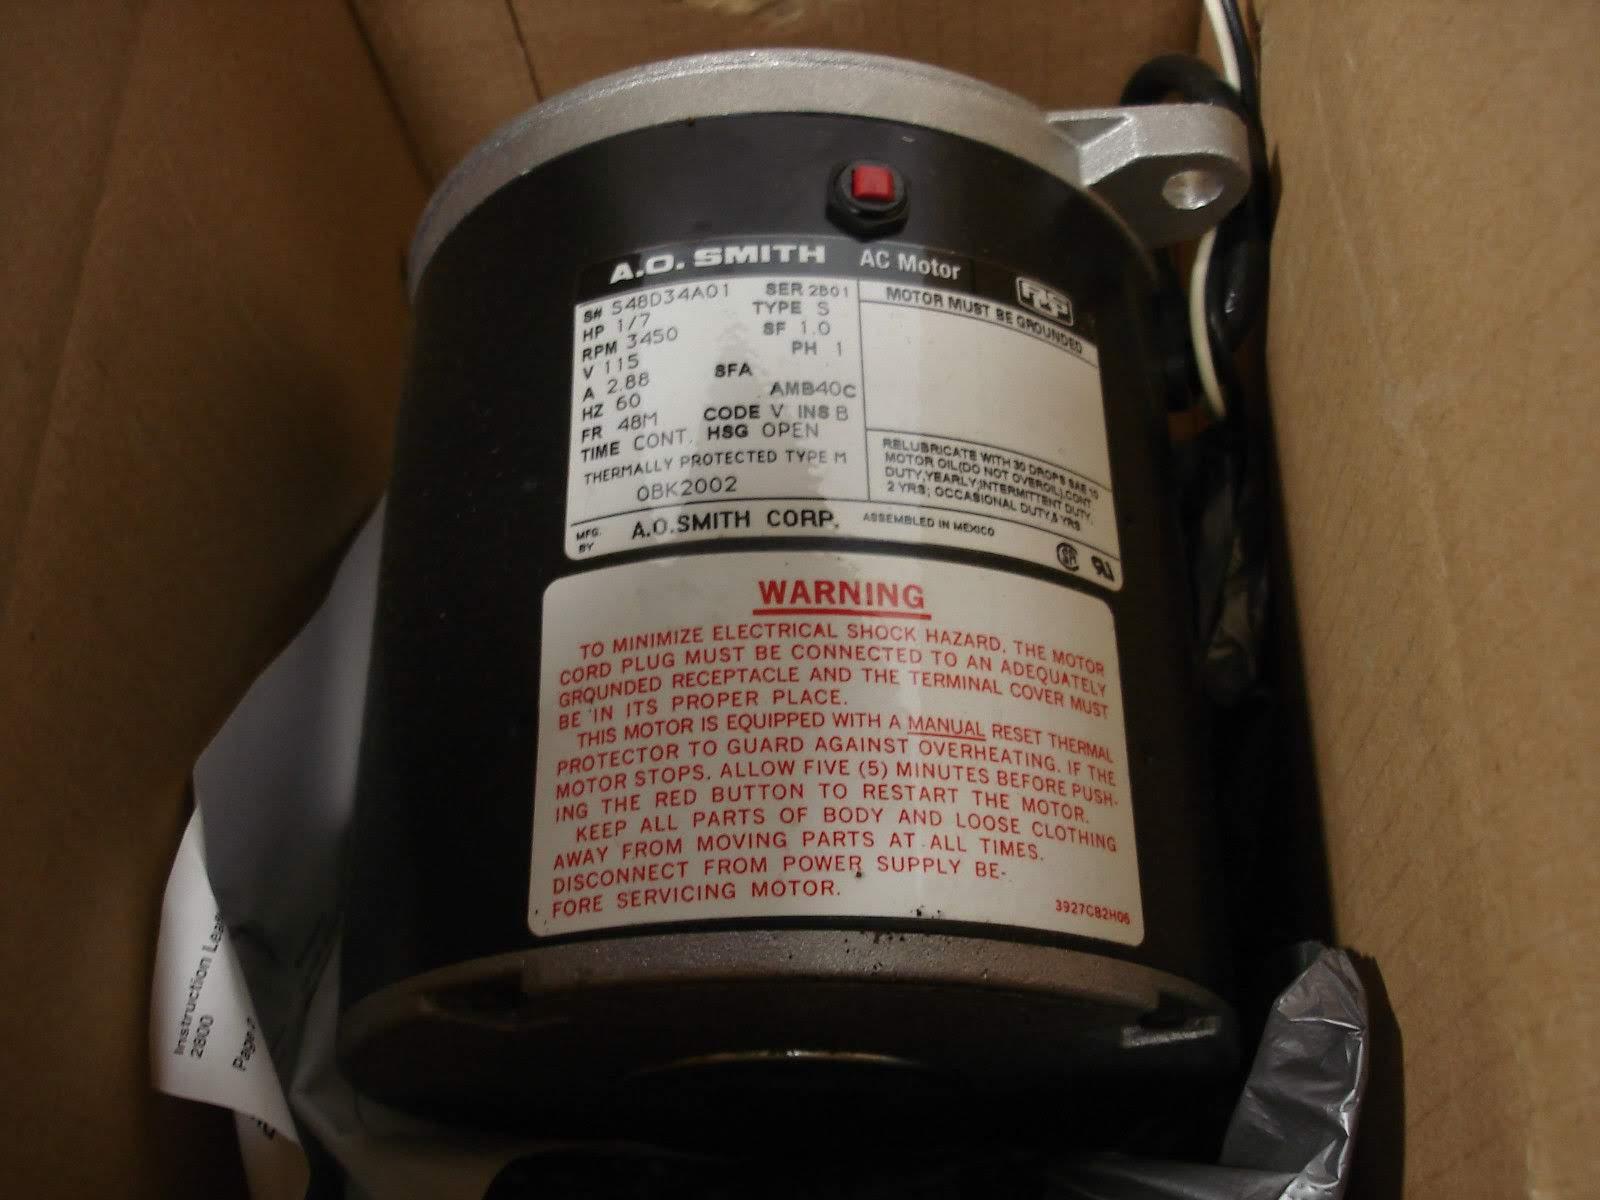 Lot 1 - (1) *NEW* AO SMITH OBK2002 OIL BURNER MOTOR HP1/7 VOLTS115 RPM3450 *NEW*; (1) *NIB* CENTURY BL6407